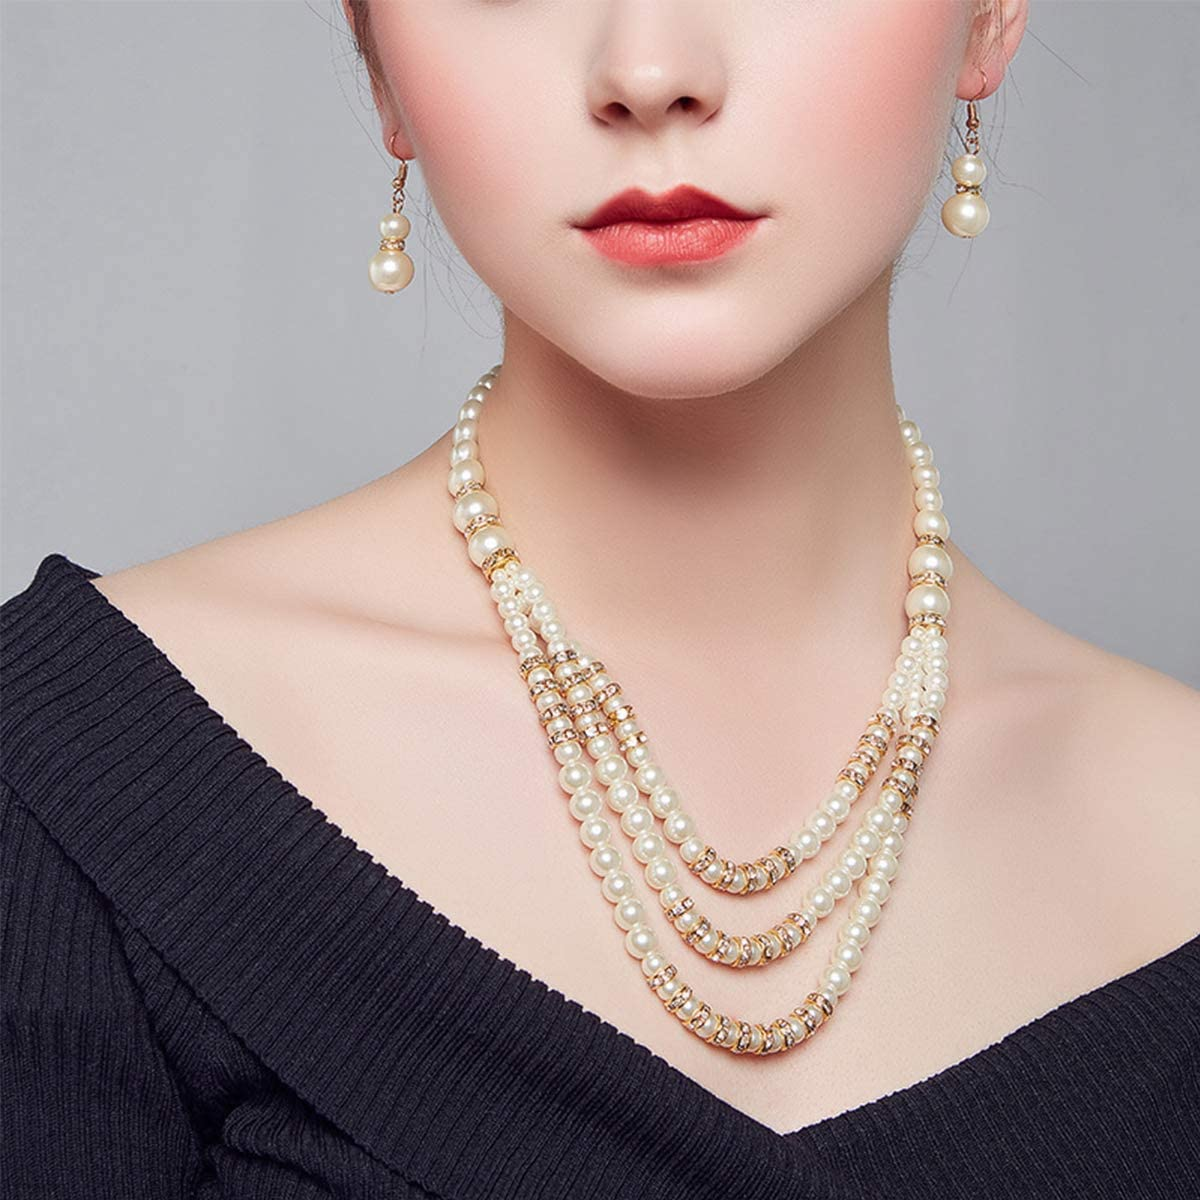 Mecool Faux Perlenschmuck Sets Halskette Ohrring Schmuck Set Multi Layer Faux Perle Strang Kost/üm Schmuck Set